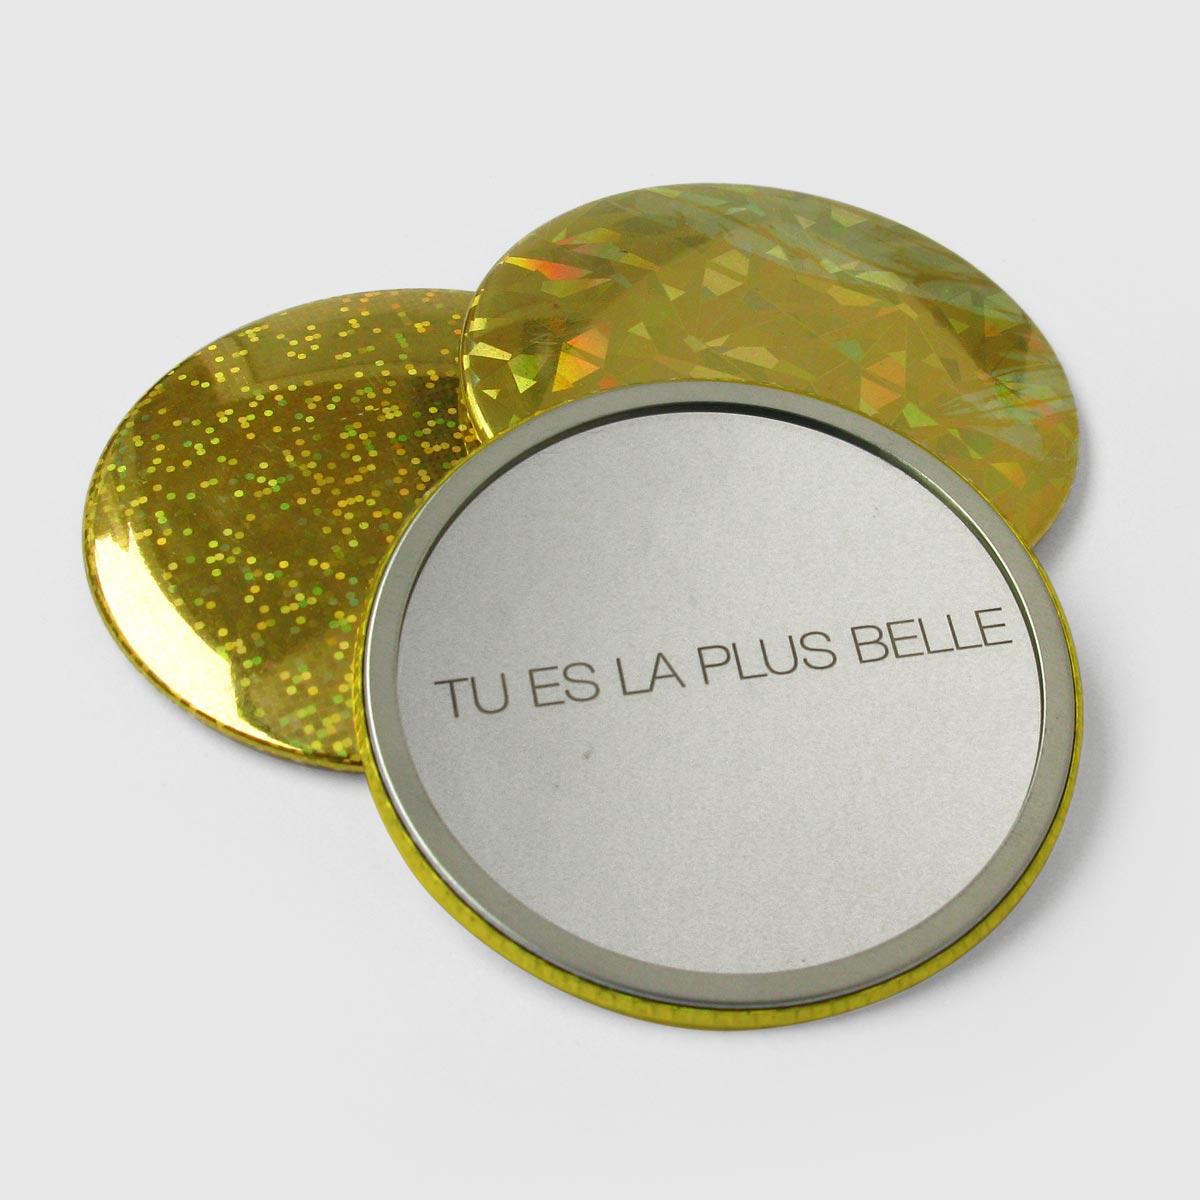 Petit cadeau calendrier @bonjourbibiche